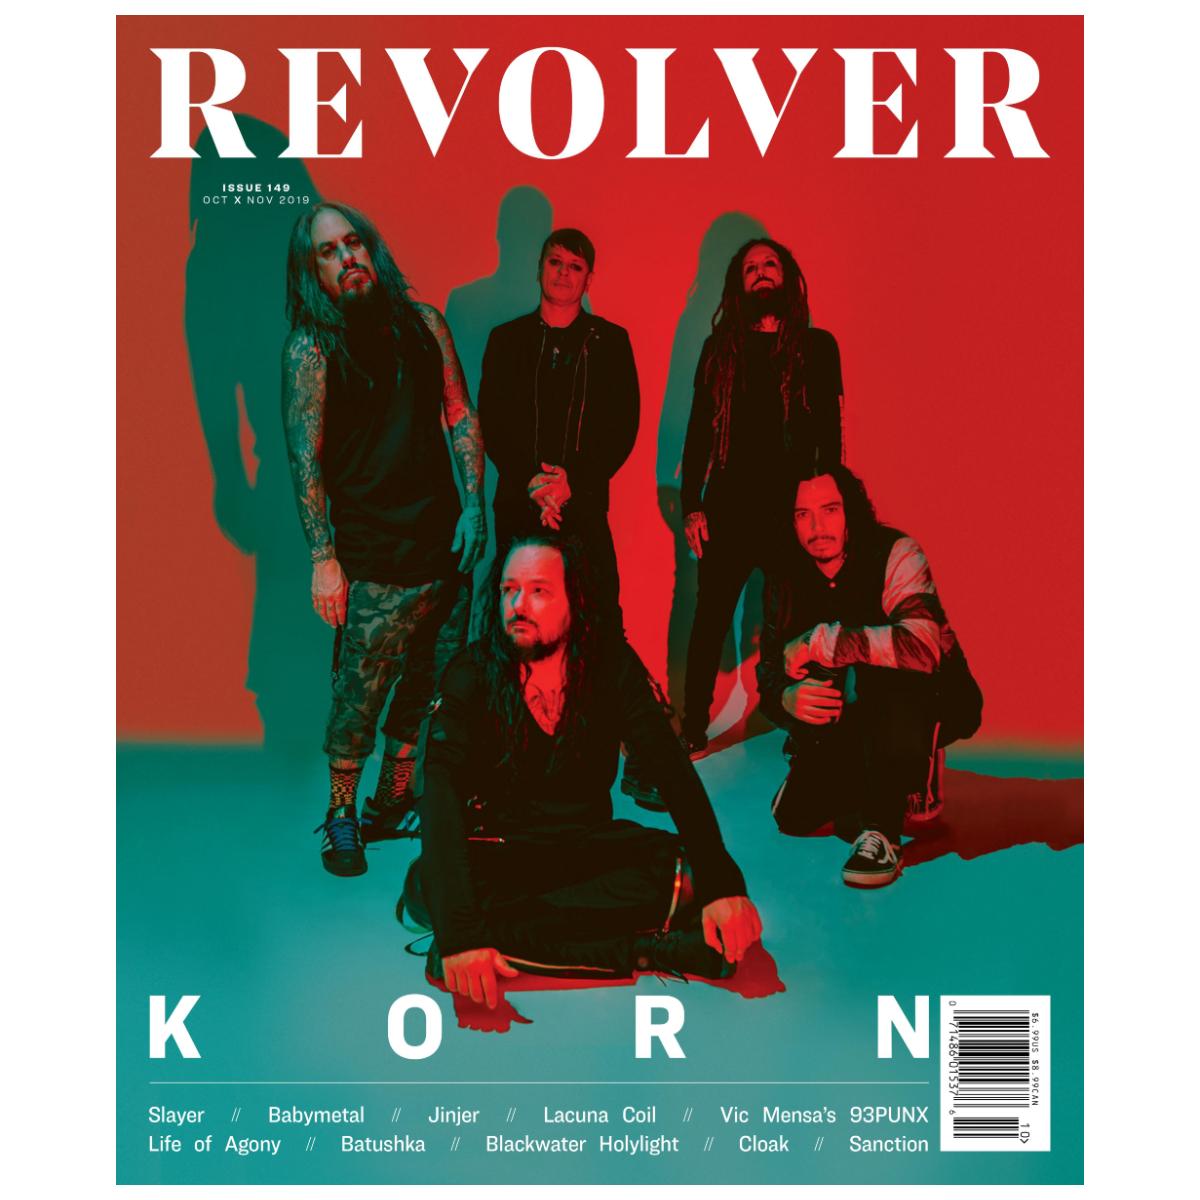 OCT/NOV 2019 ISSUE FEATURING KORN